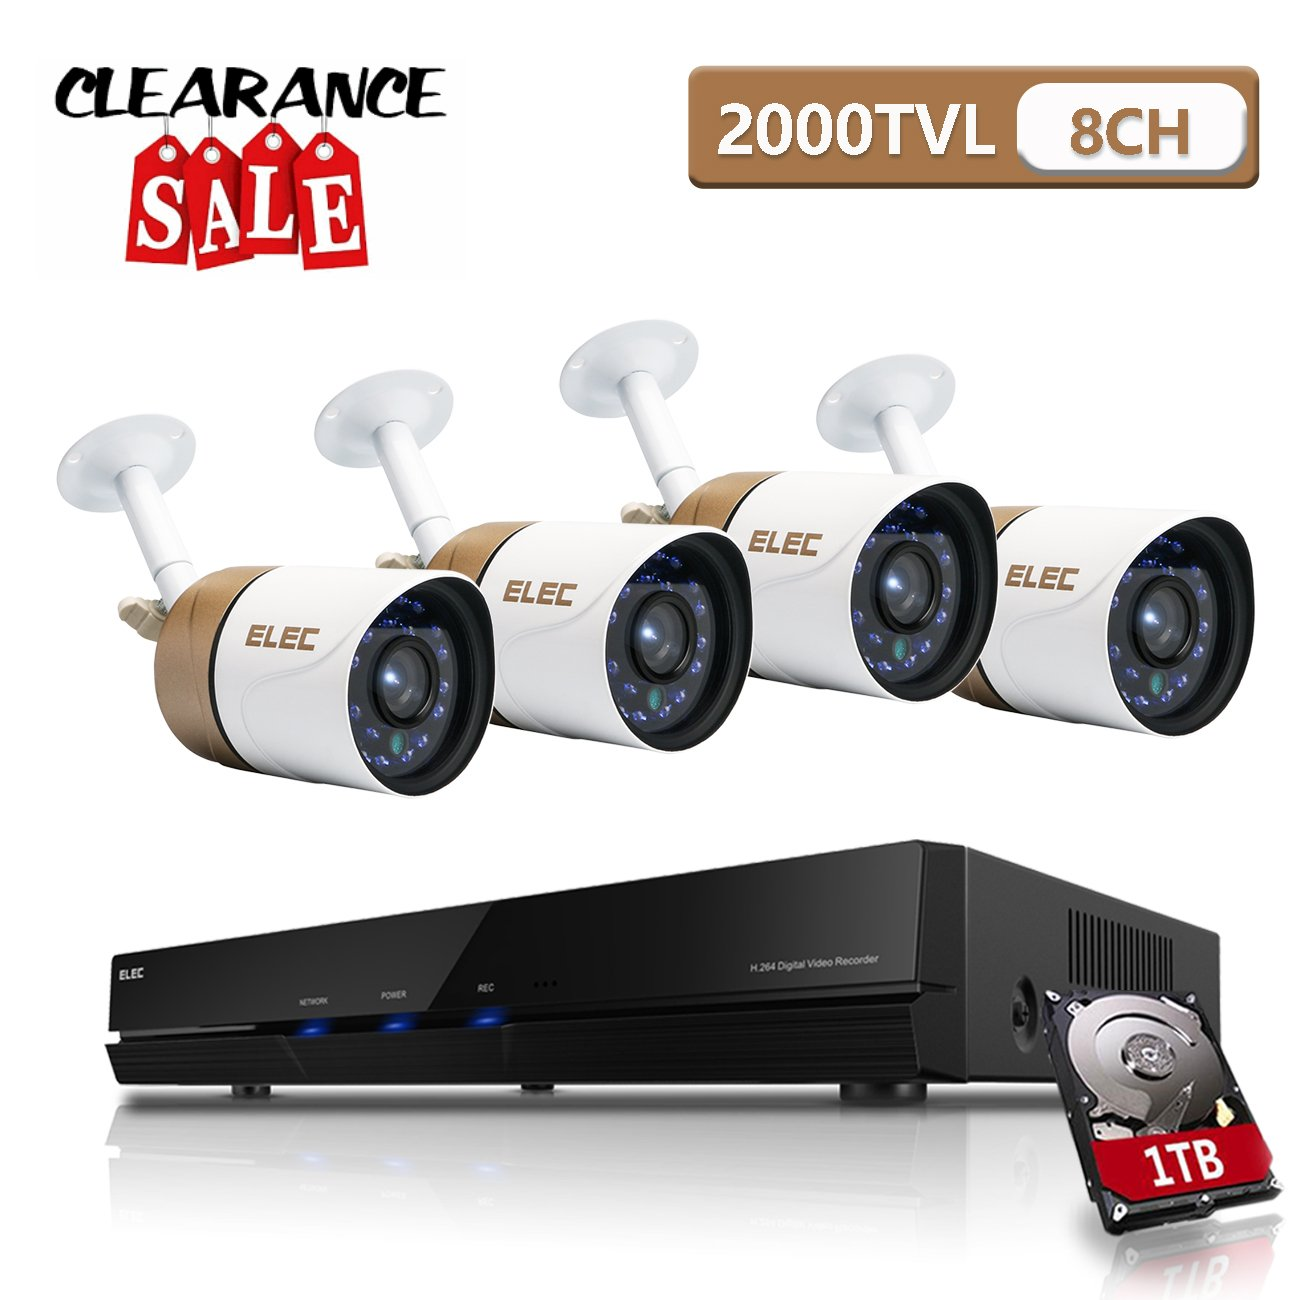 ELEC AHD 720P 8CH DVR Video Surveillance Security Camera System Pre-Installed 1TB Hard Drive, 2000TVL 1.3MP 4 CCTV Weatherproof 60ft Night Vision Bullet Cameras Remote Access